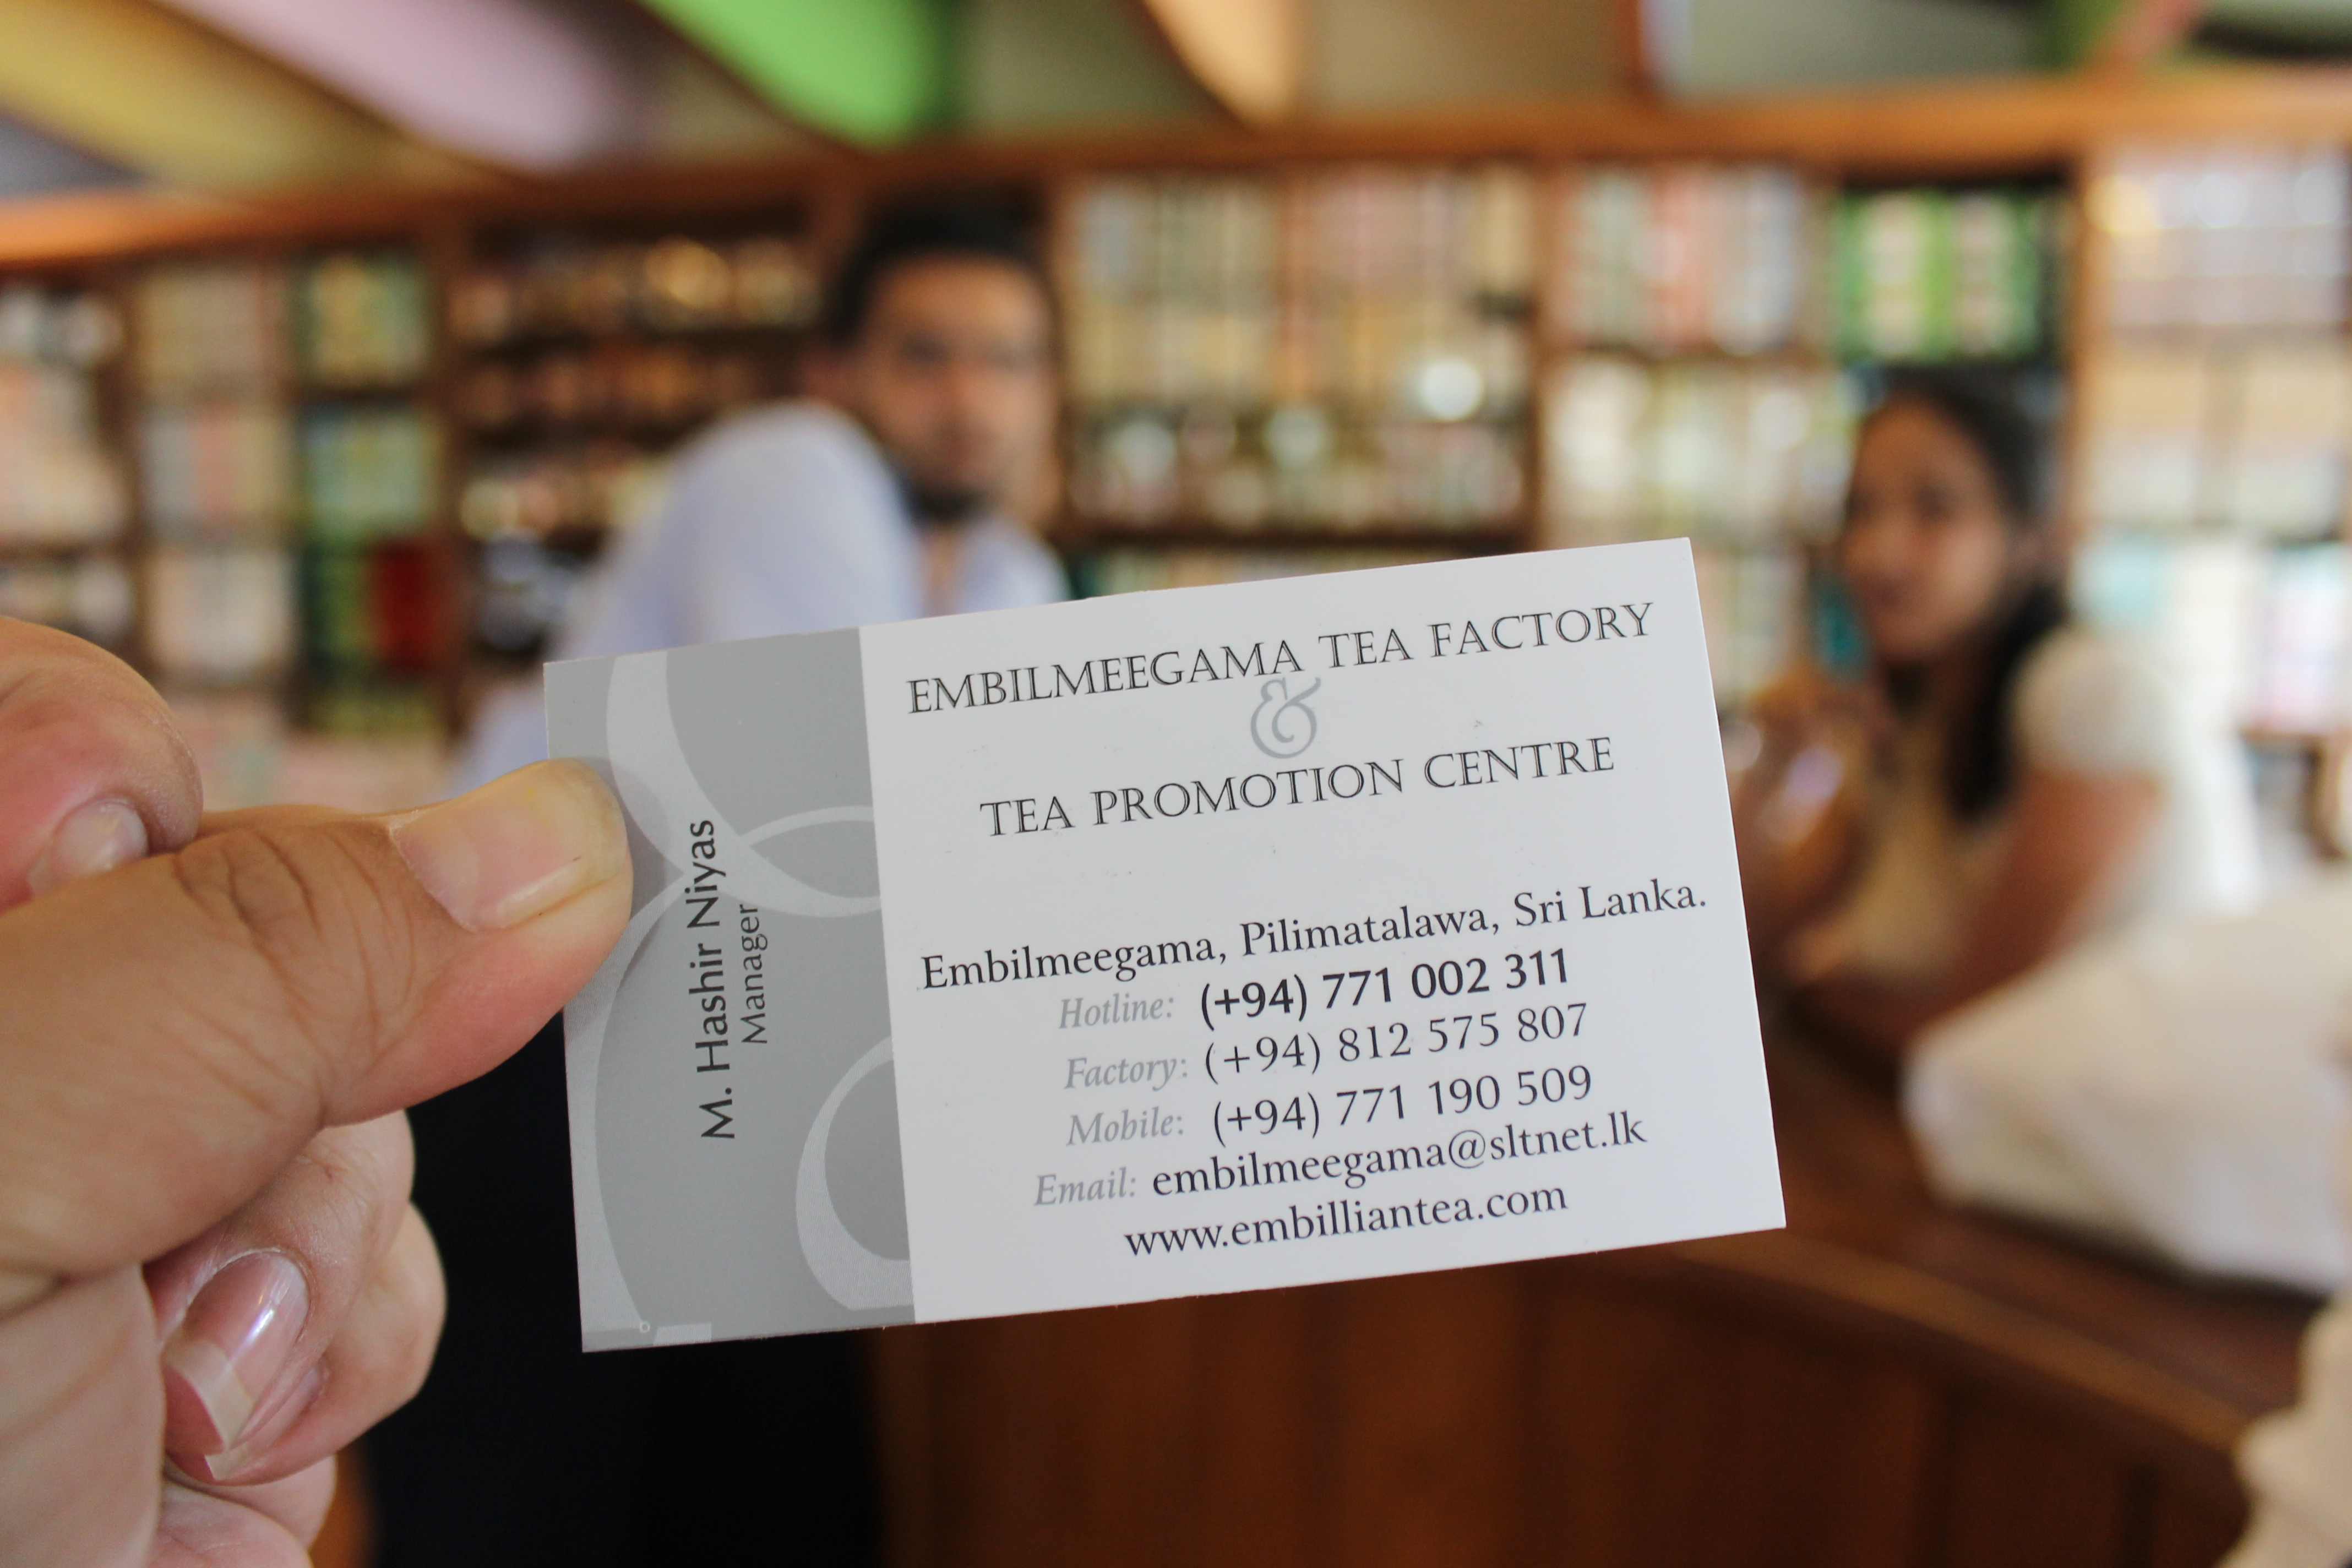 The tea shop business card.